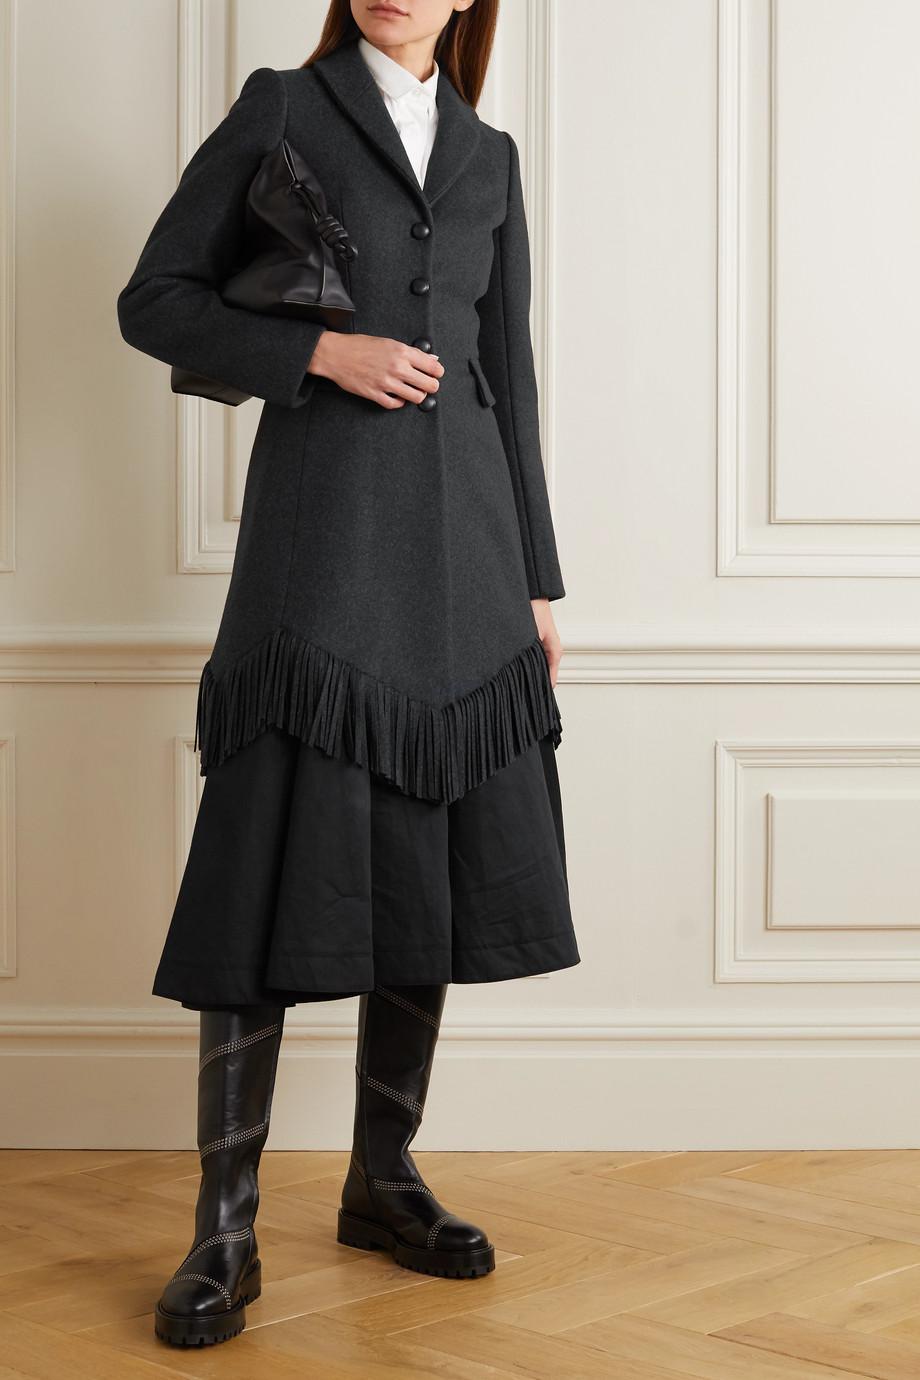 Alaïa Fringed wool and cashmere blend coat